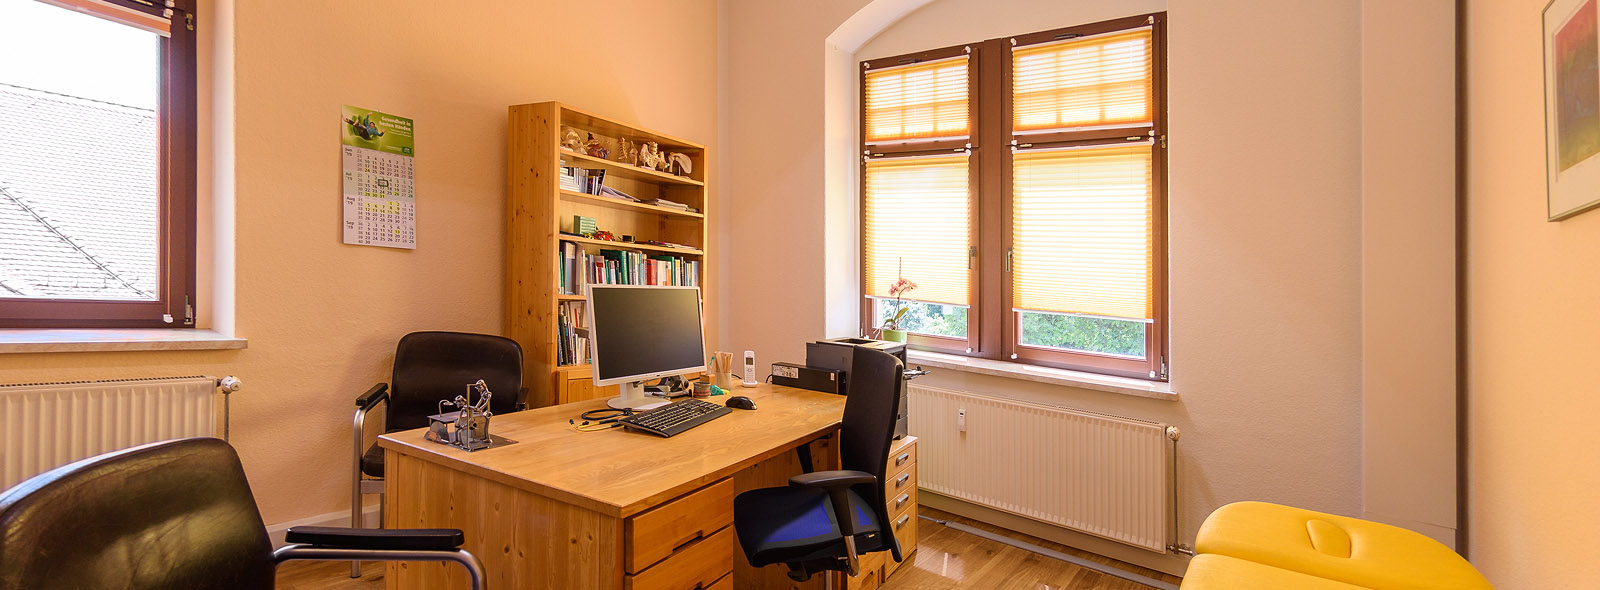 Hausarztpraxis Barthel in Dresden-Bühlau